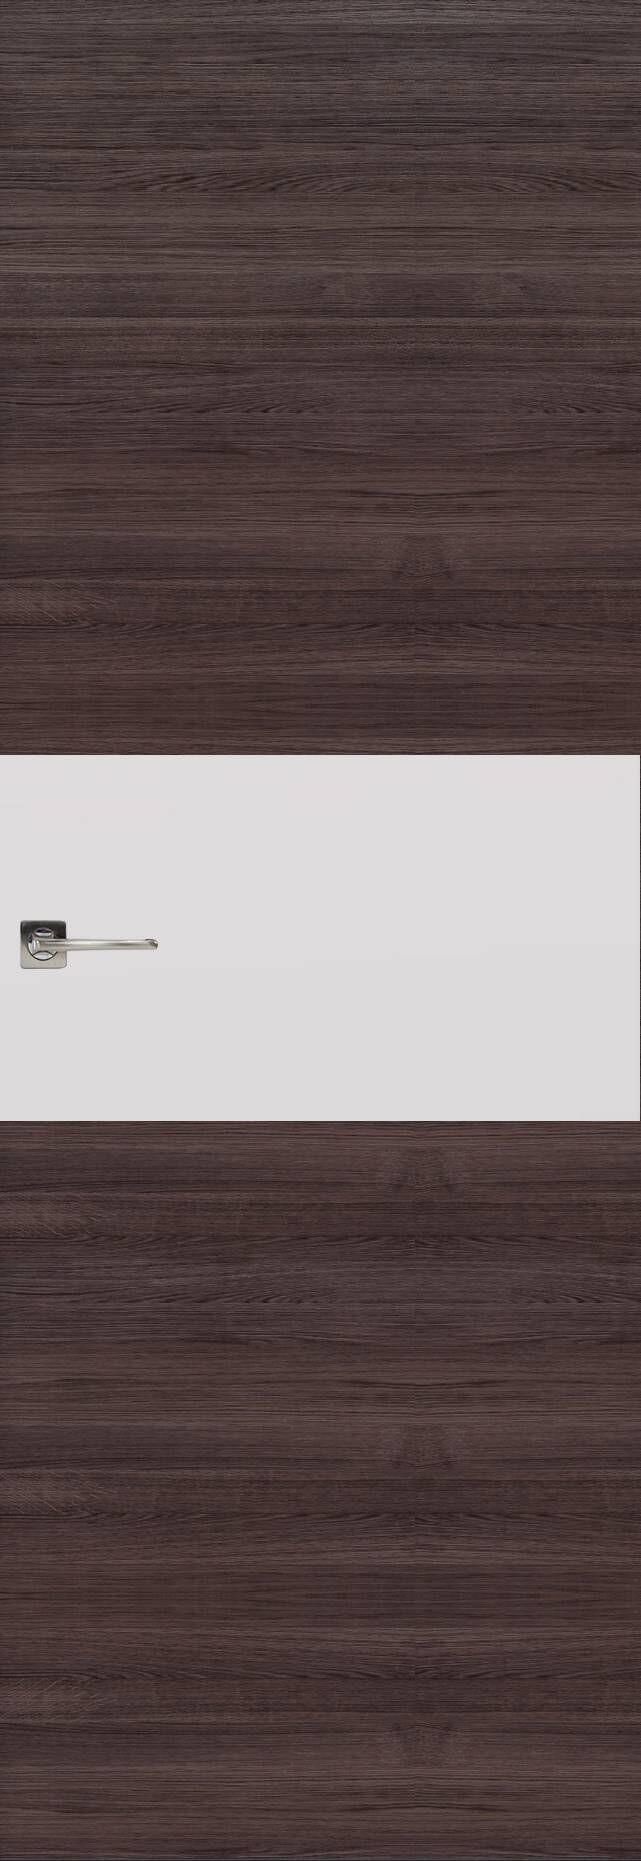 Tivoli Е-4 Invisible цвет - Венге Нуар Без стекла (ДГ)